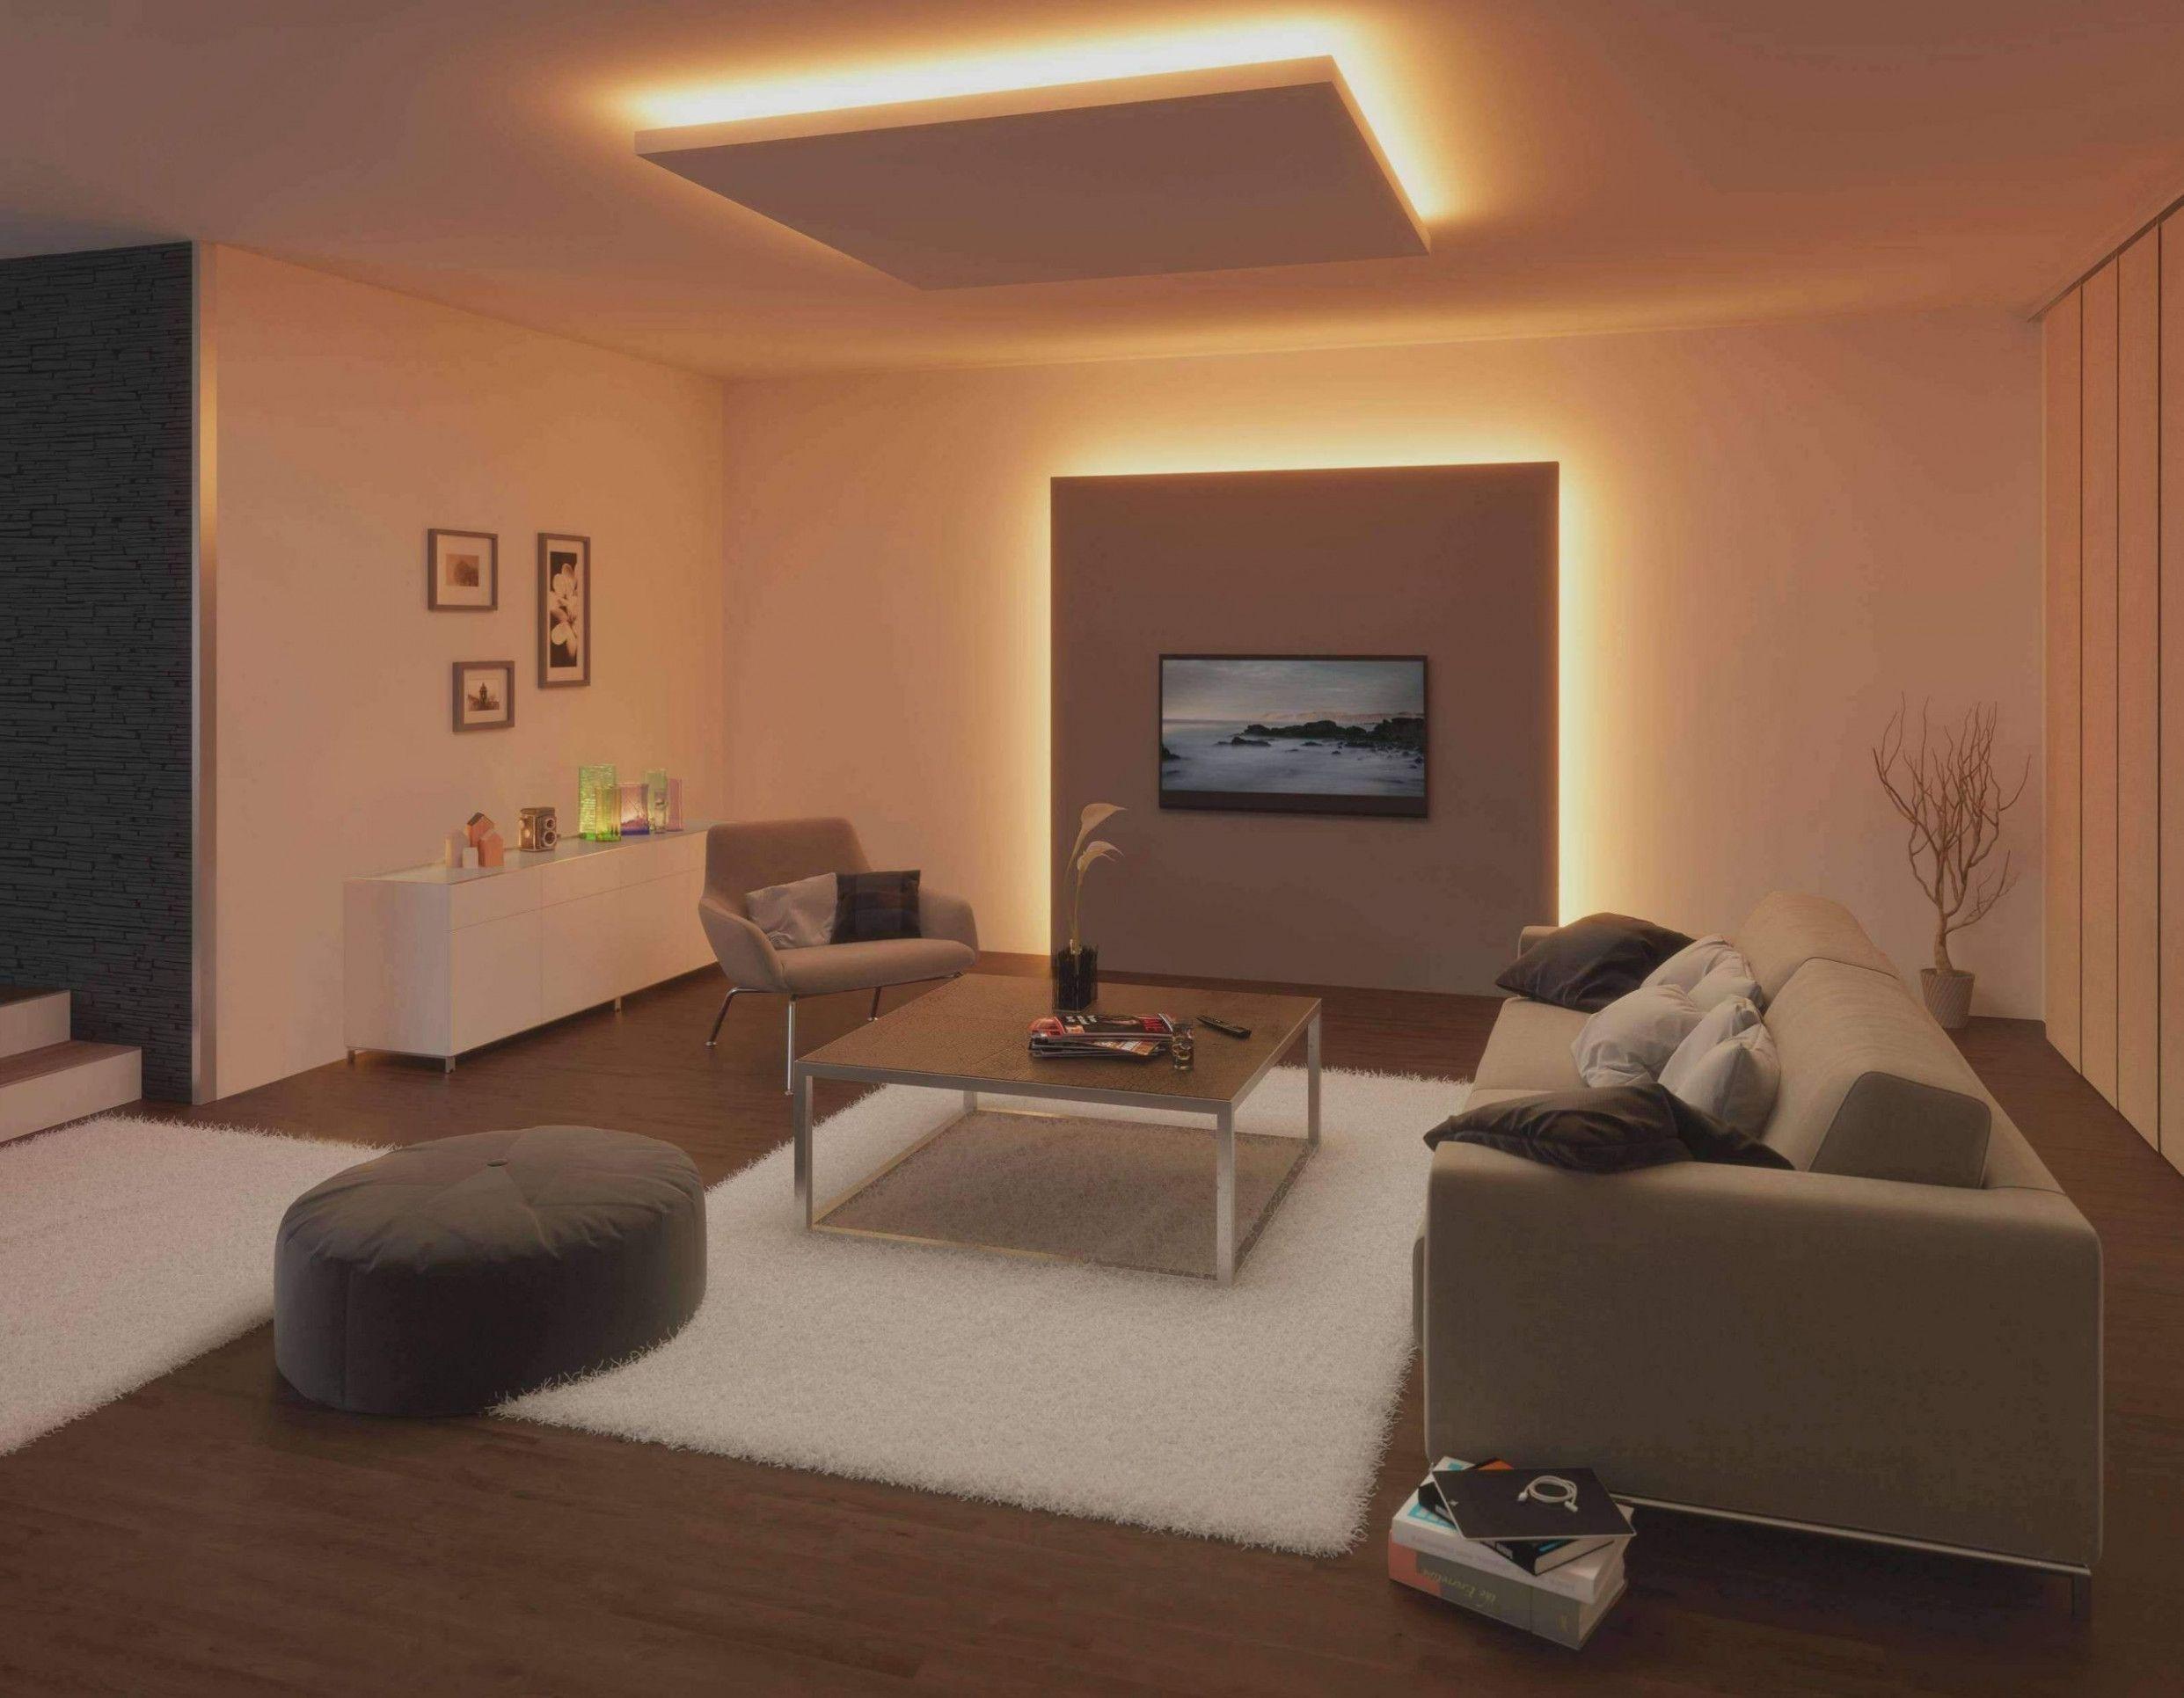 10 Wohnzimmer Lampe Stylisch di 10  Dekorasi ruang keluarga